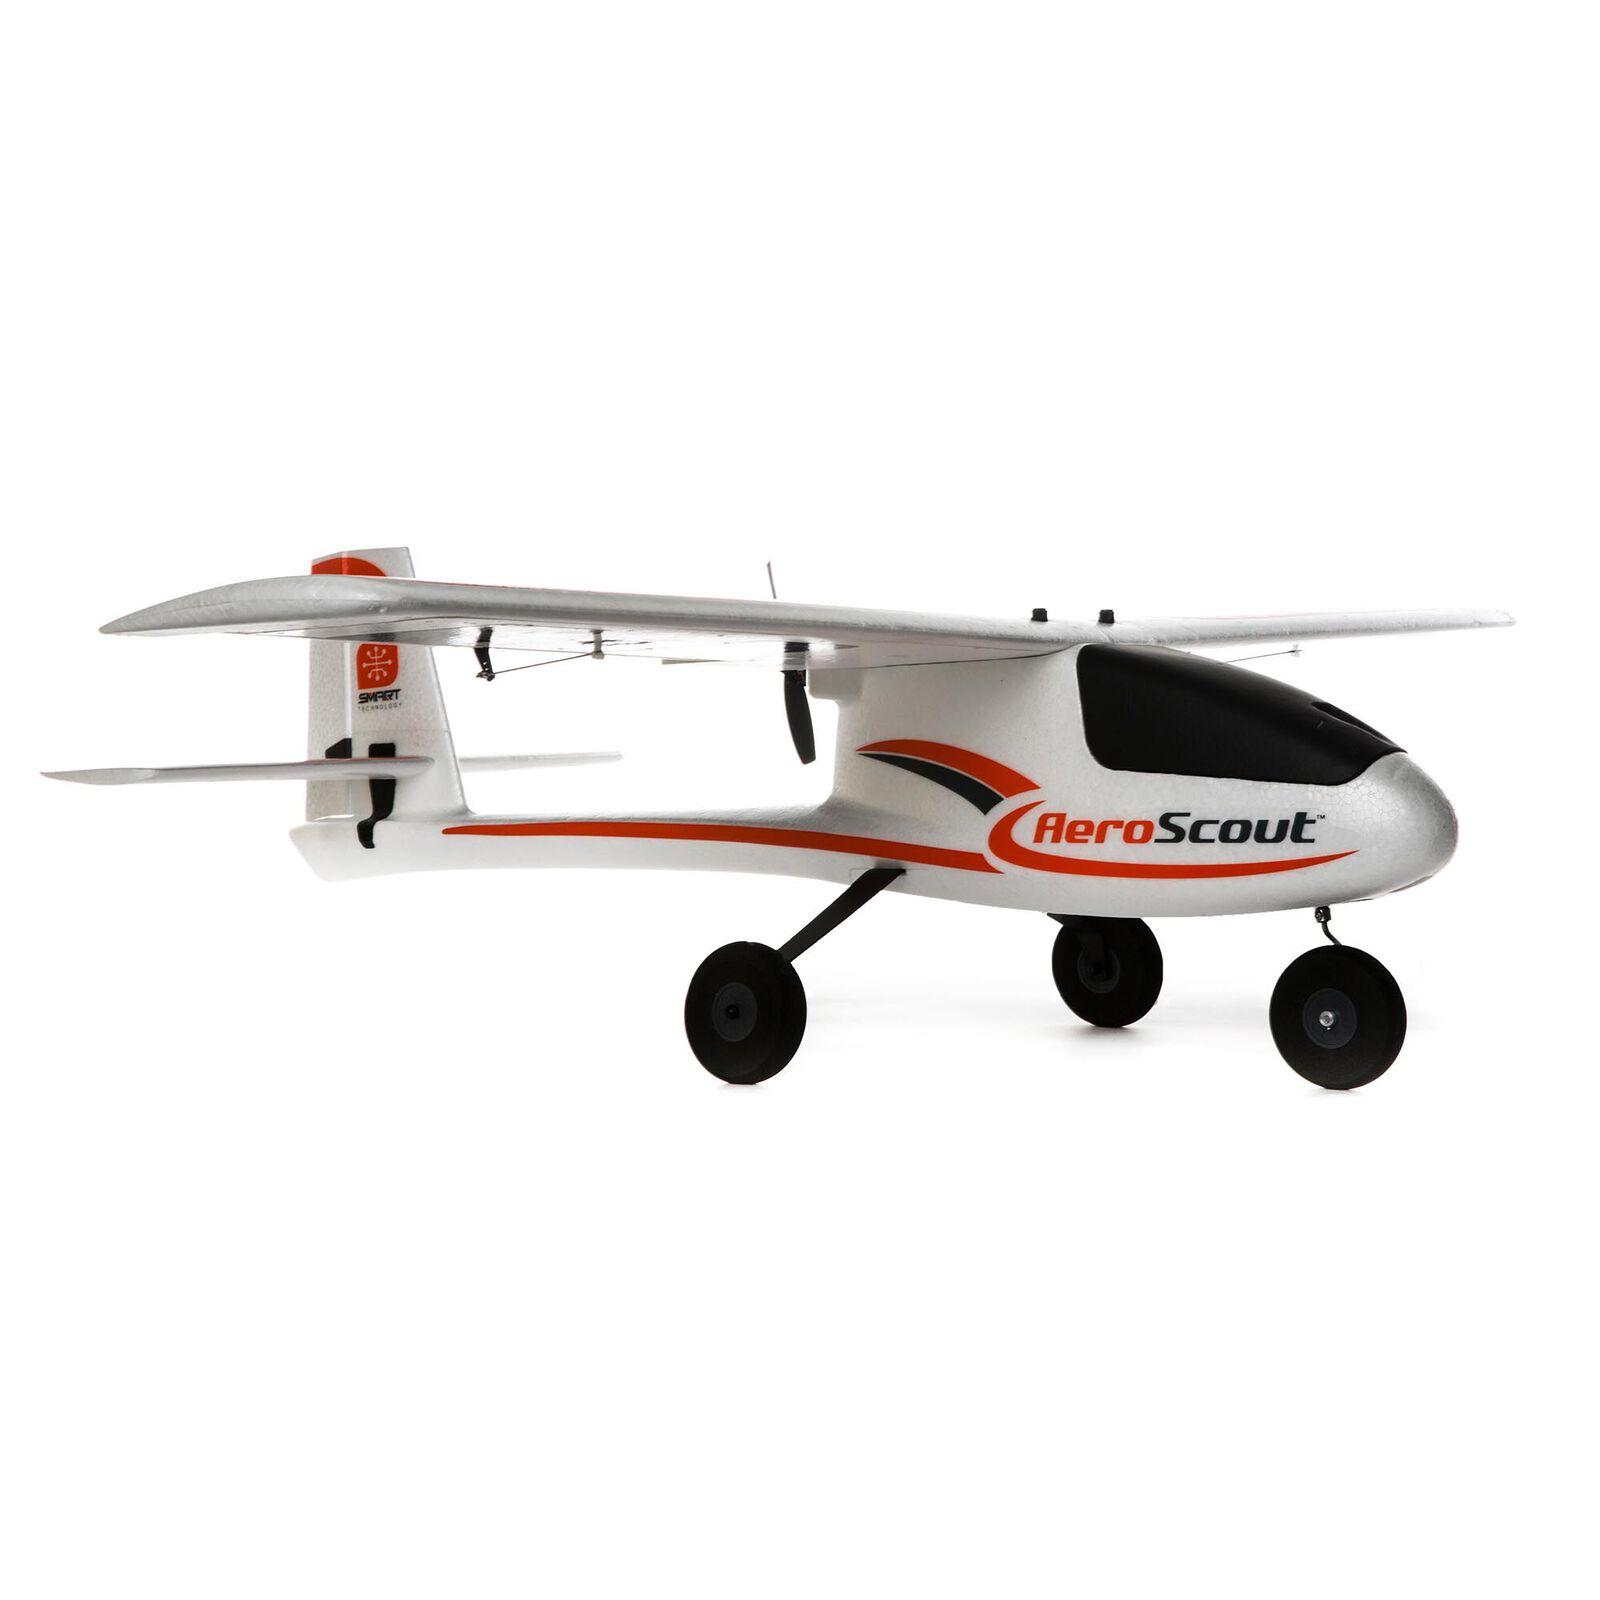 AeroScout S 2 1.1m RTF